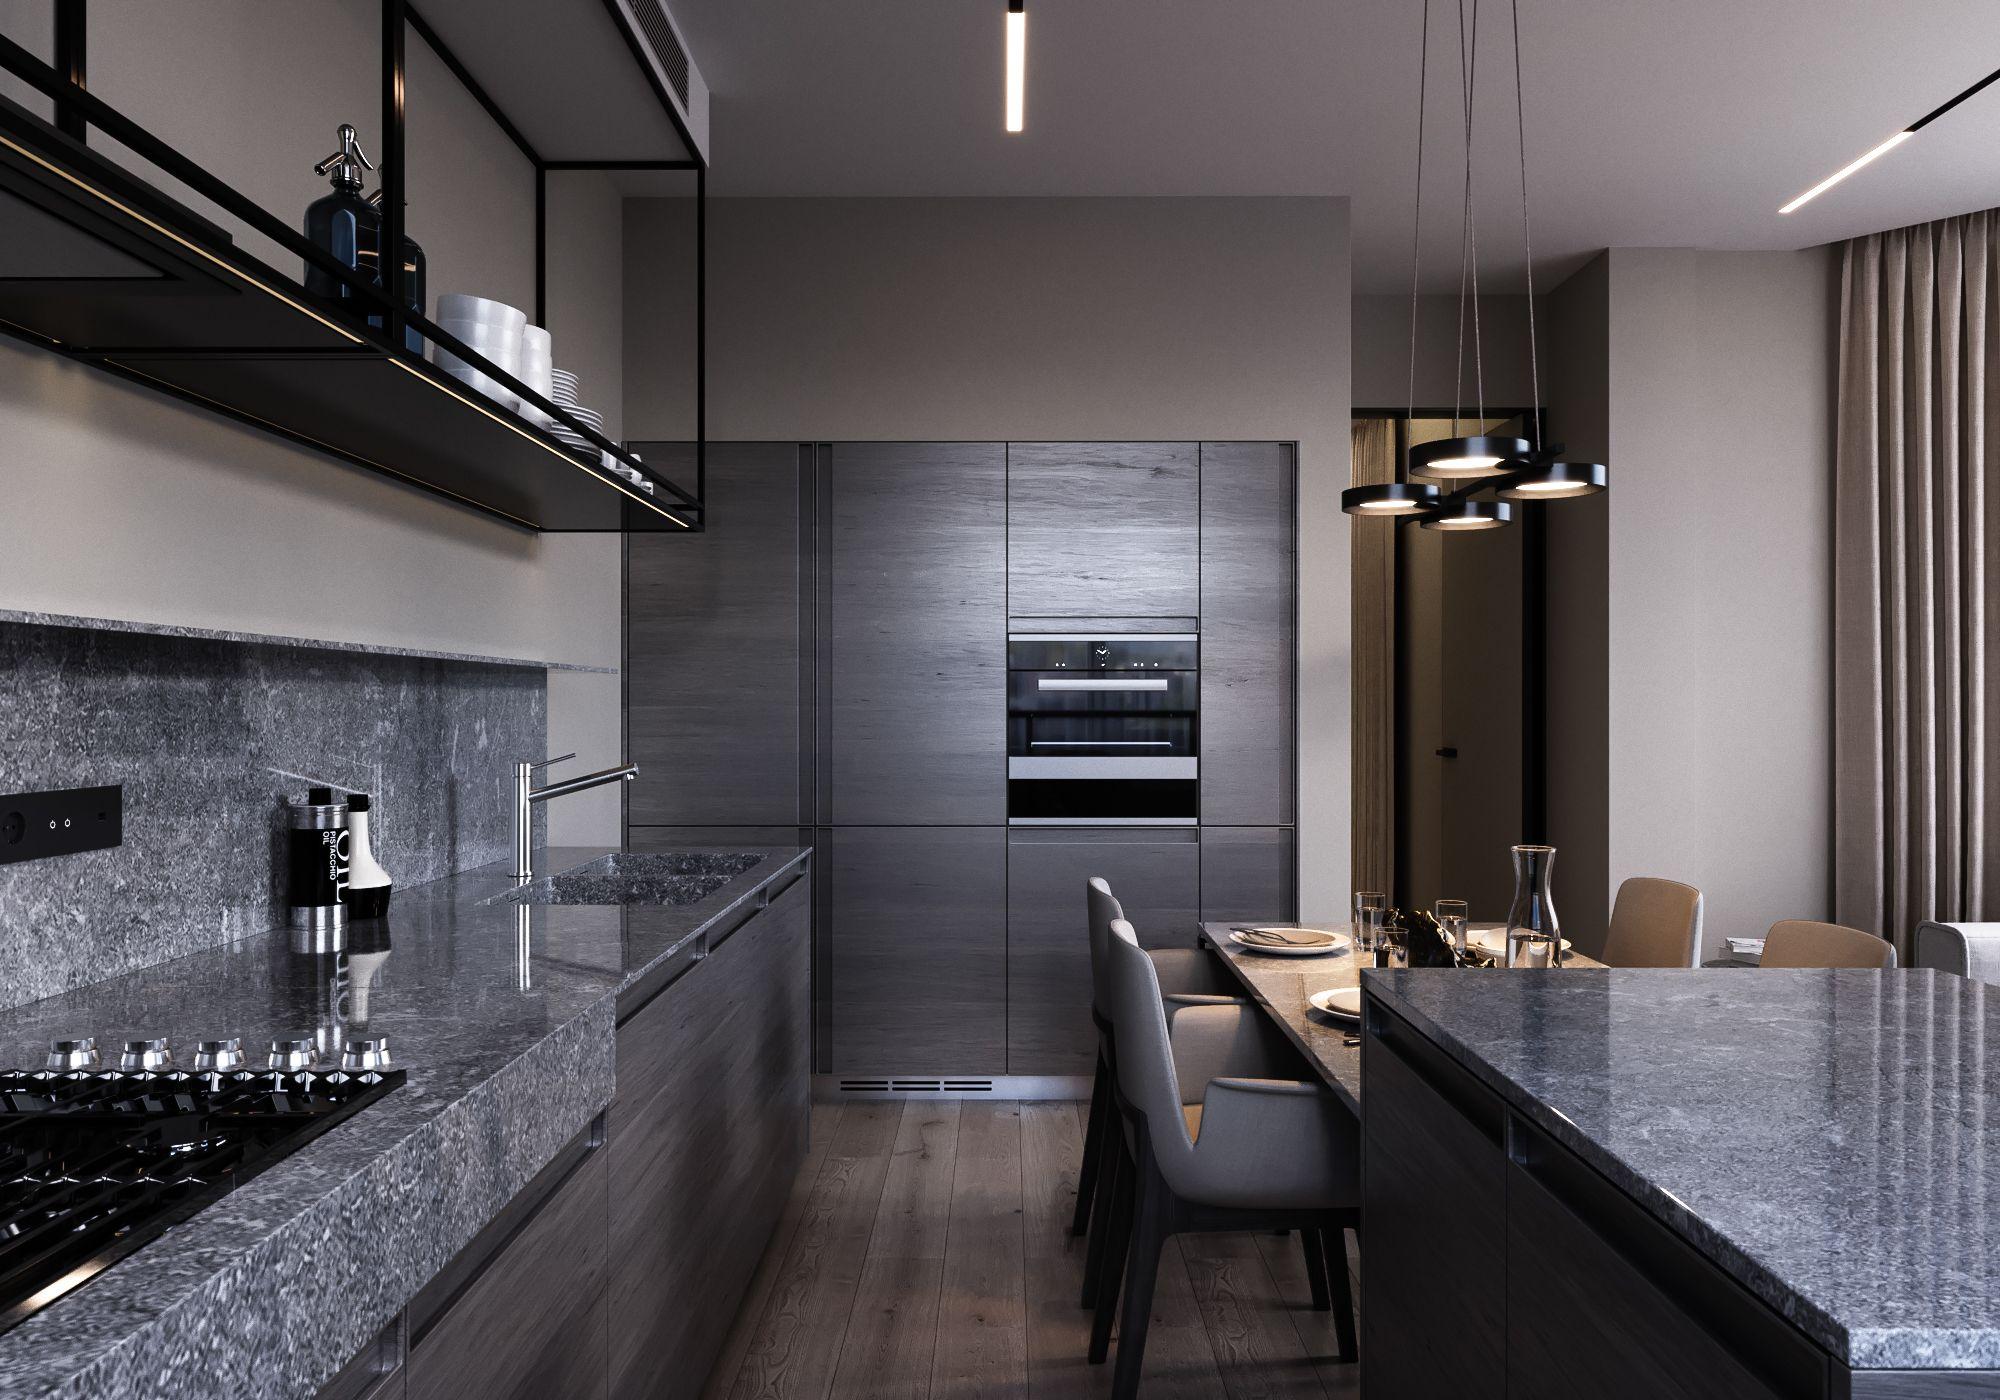 Pt arystokraty with kitchen moon by anova on behance kitchens